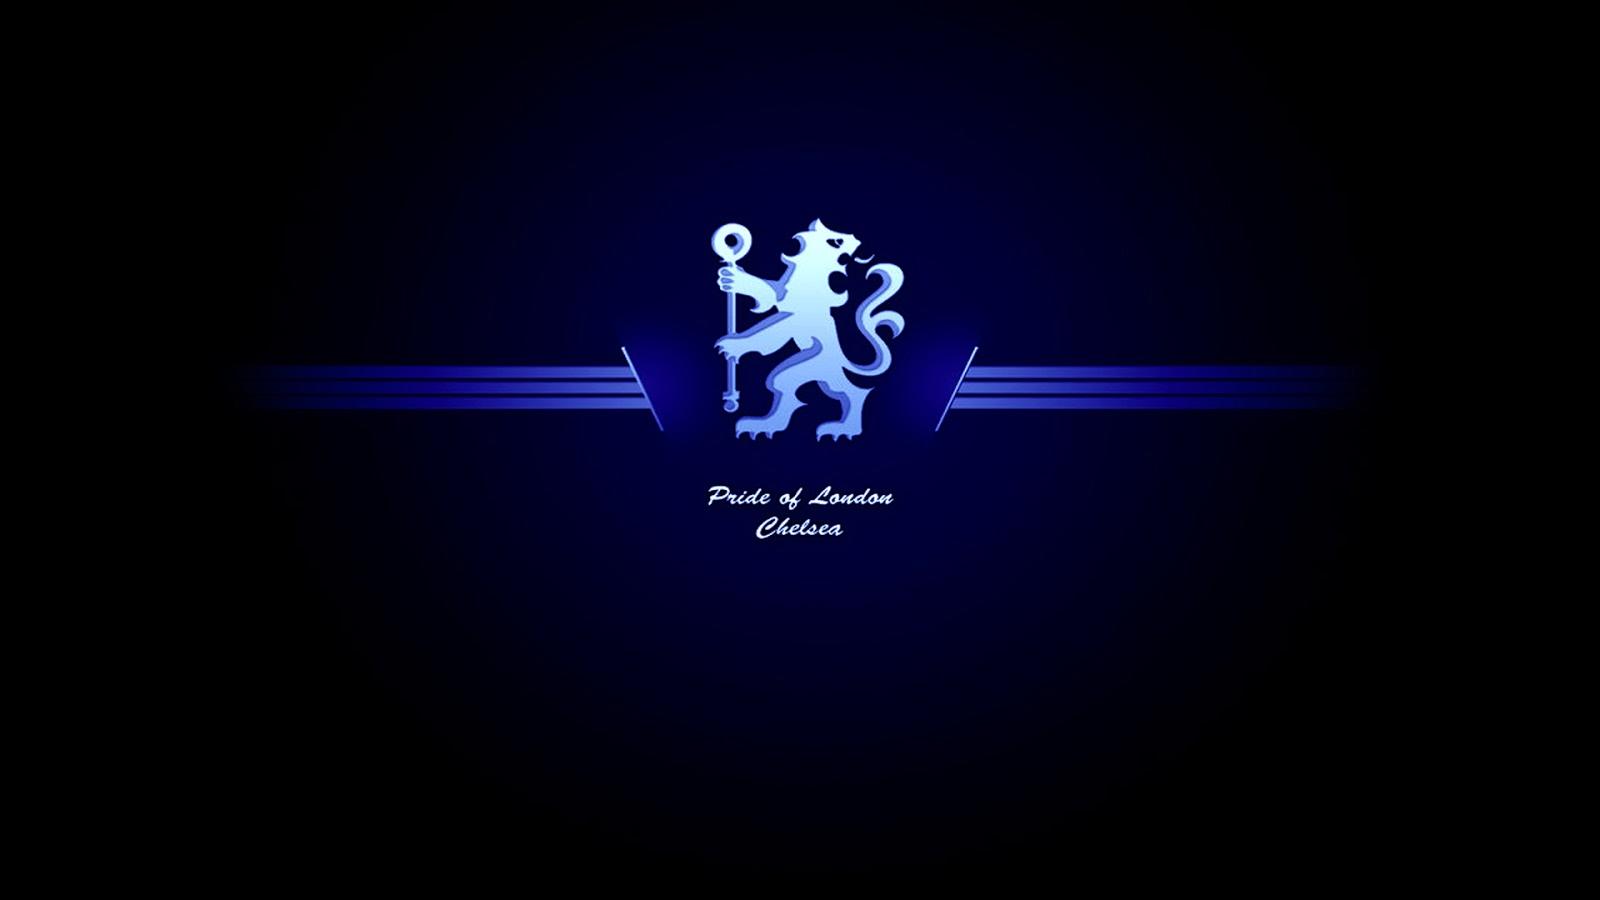 Chelsea football club hd wallpapers - Chelsea wallpaper 2018 hd ...